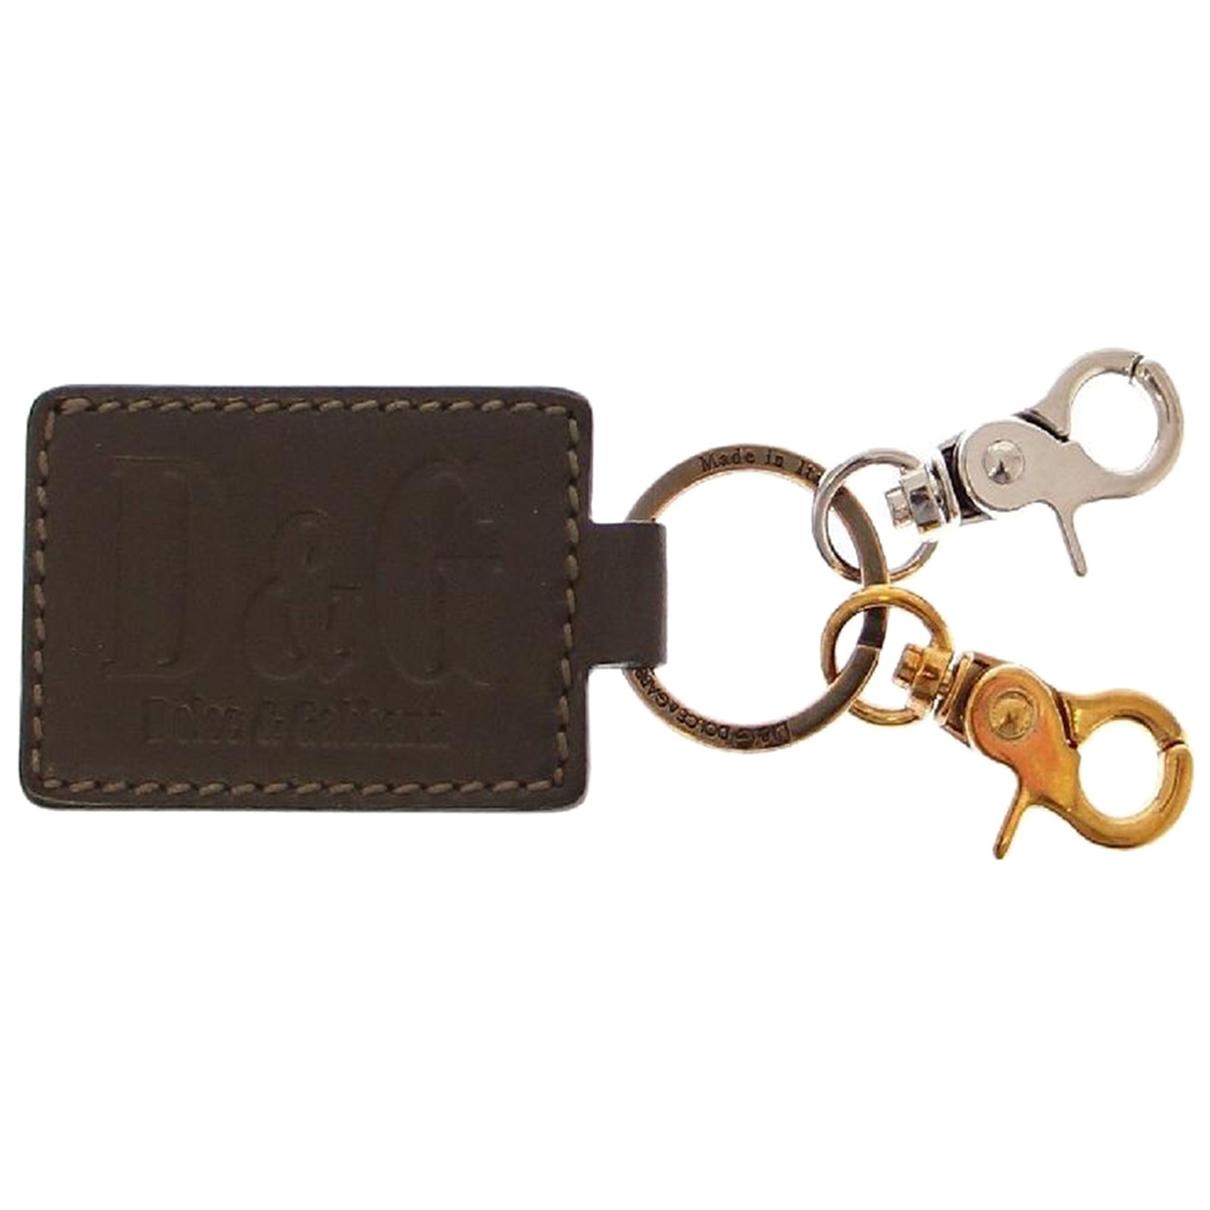 D&g \N Purses, wallet & cases for Women \N